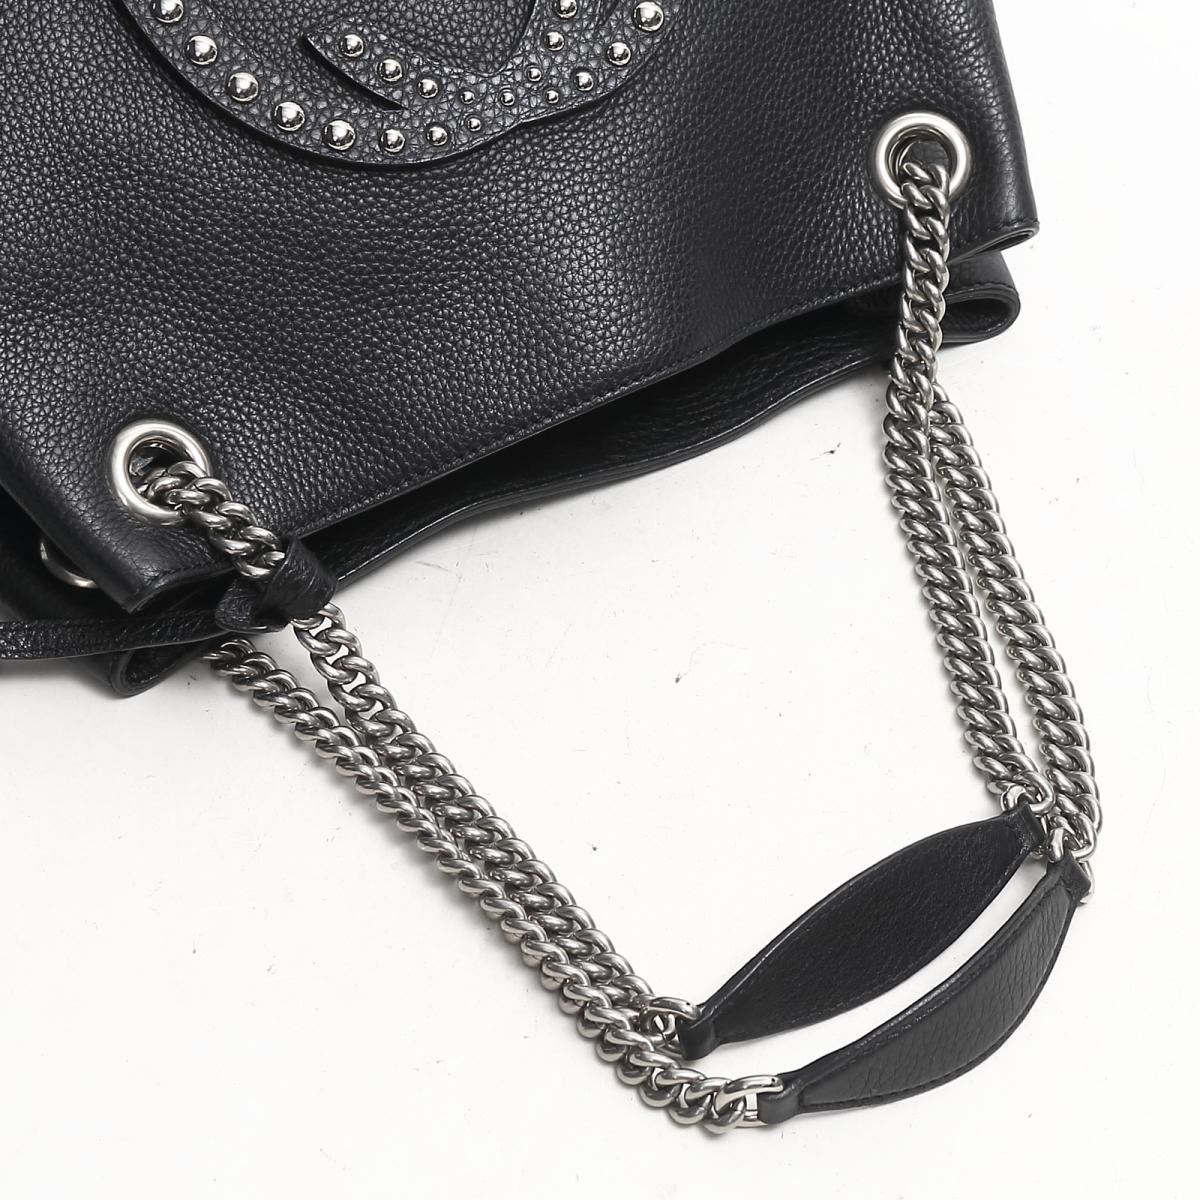 610dfb1f Gucci Soho interlocking grip G chain shoulder bag bag lady leather black  (308982)